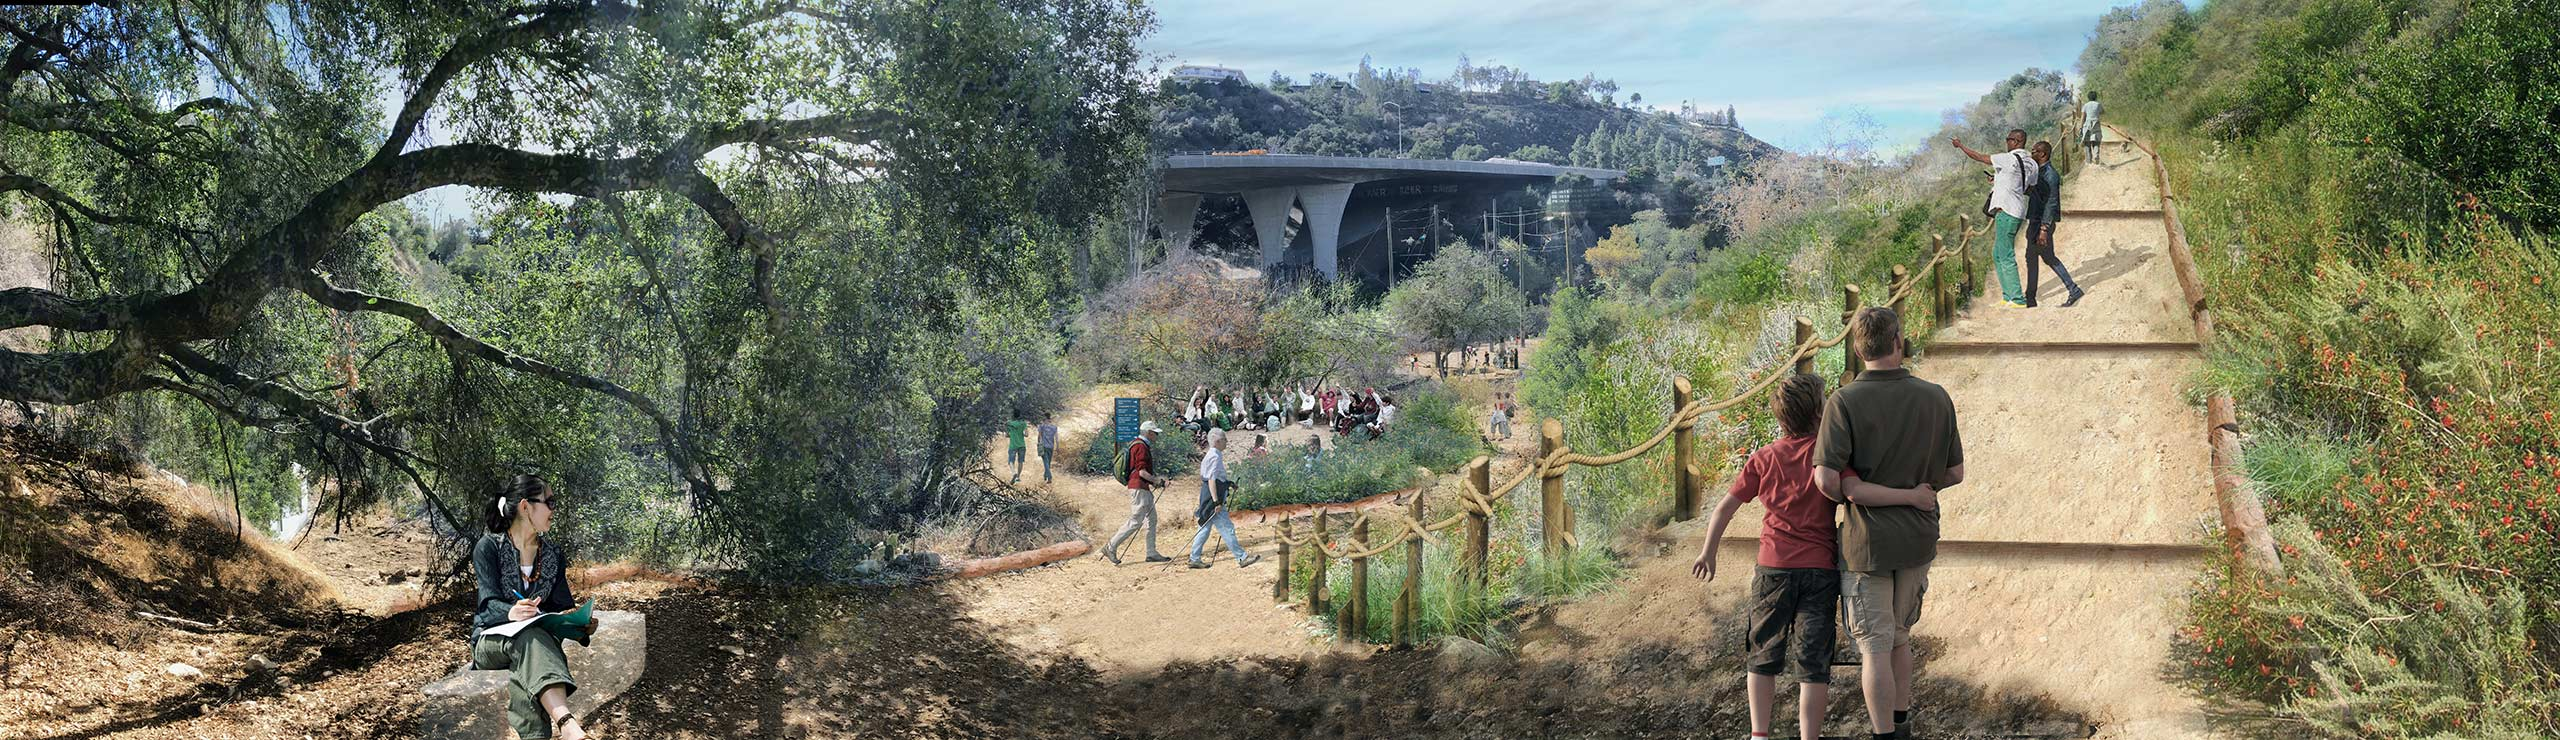 Arroyo-Seco-One-Arroyo-upper-node-Rios-Clementi-Hale-Studios